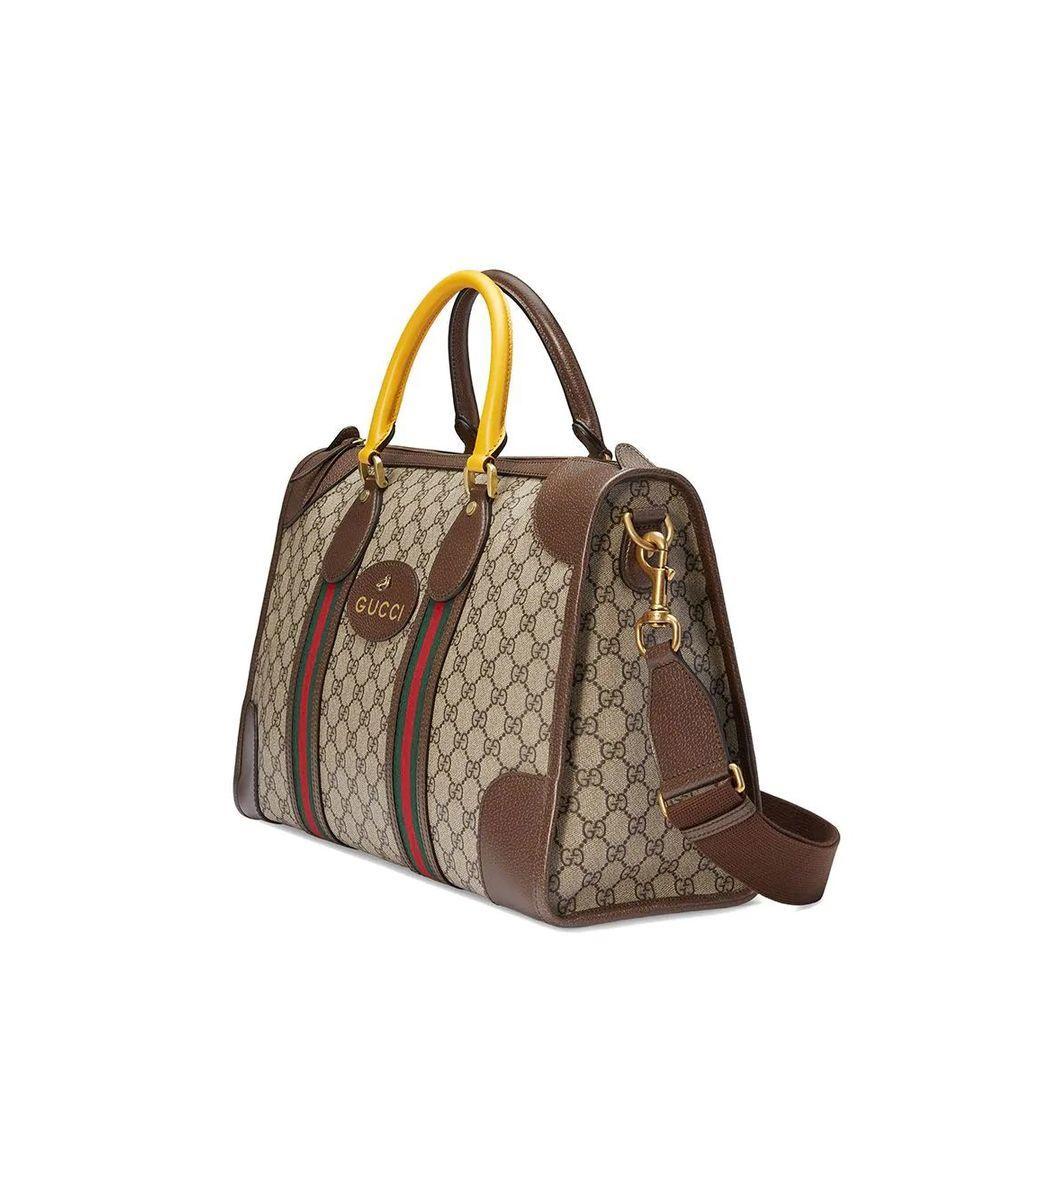 911a001d44c3 Gucci - Natural Soft GG Supreme Duffle Bag With Web - Lyst. View fullscreen